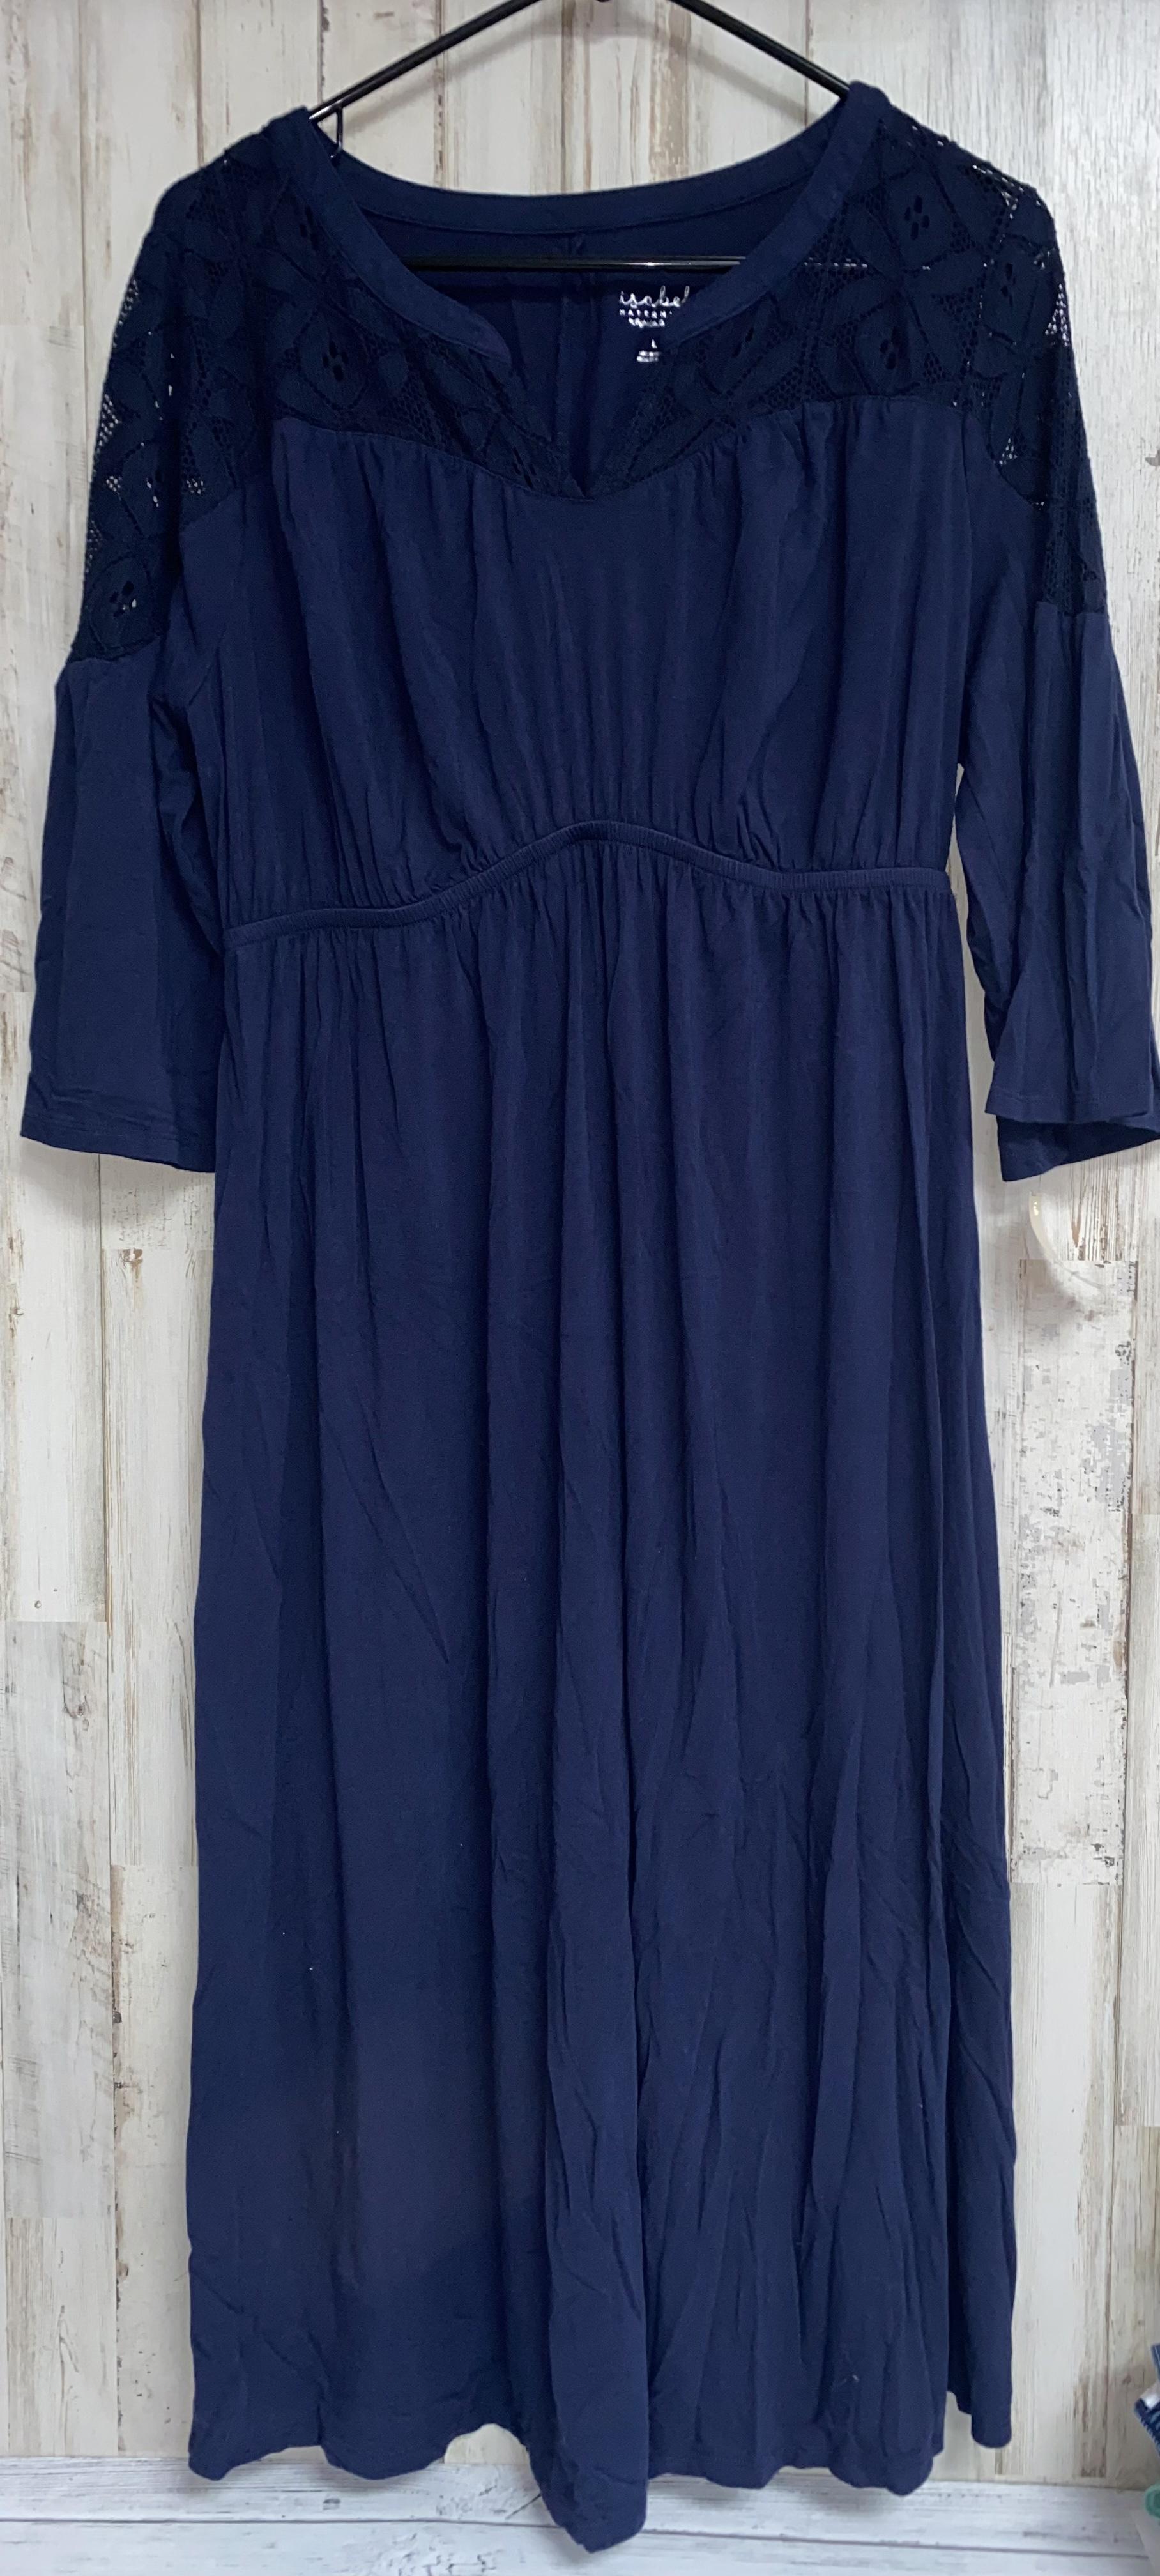 L Navy Lace Sleeve Dress, Navy, Size: Ladies L